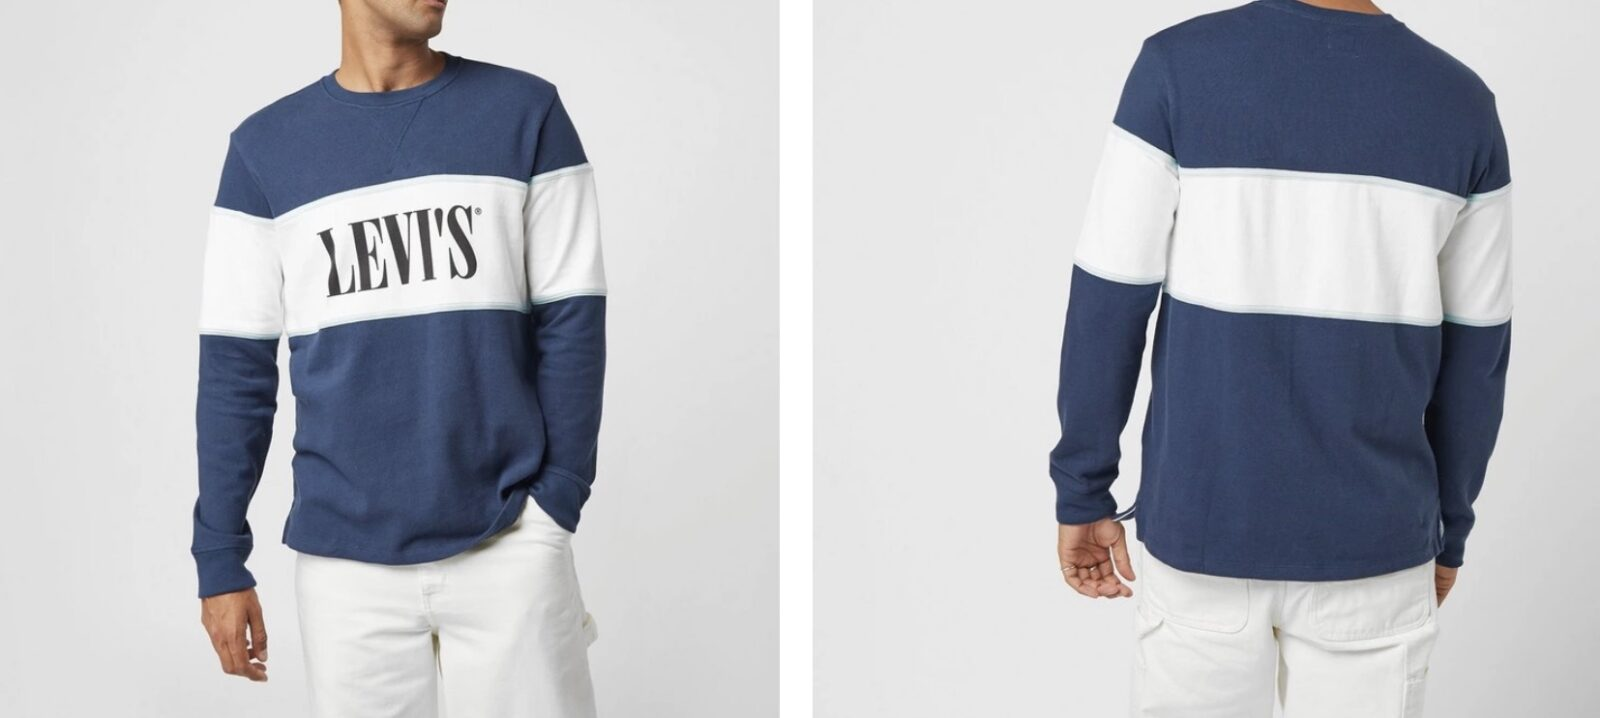 Levi's Block Sweatshirt White Blue